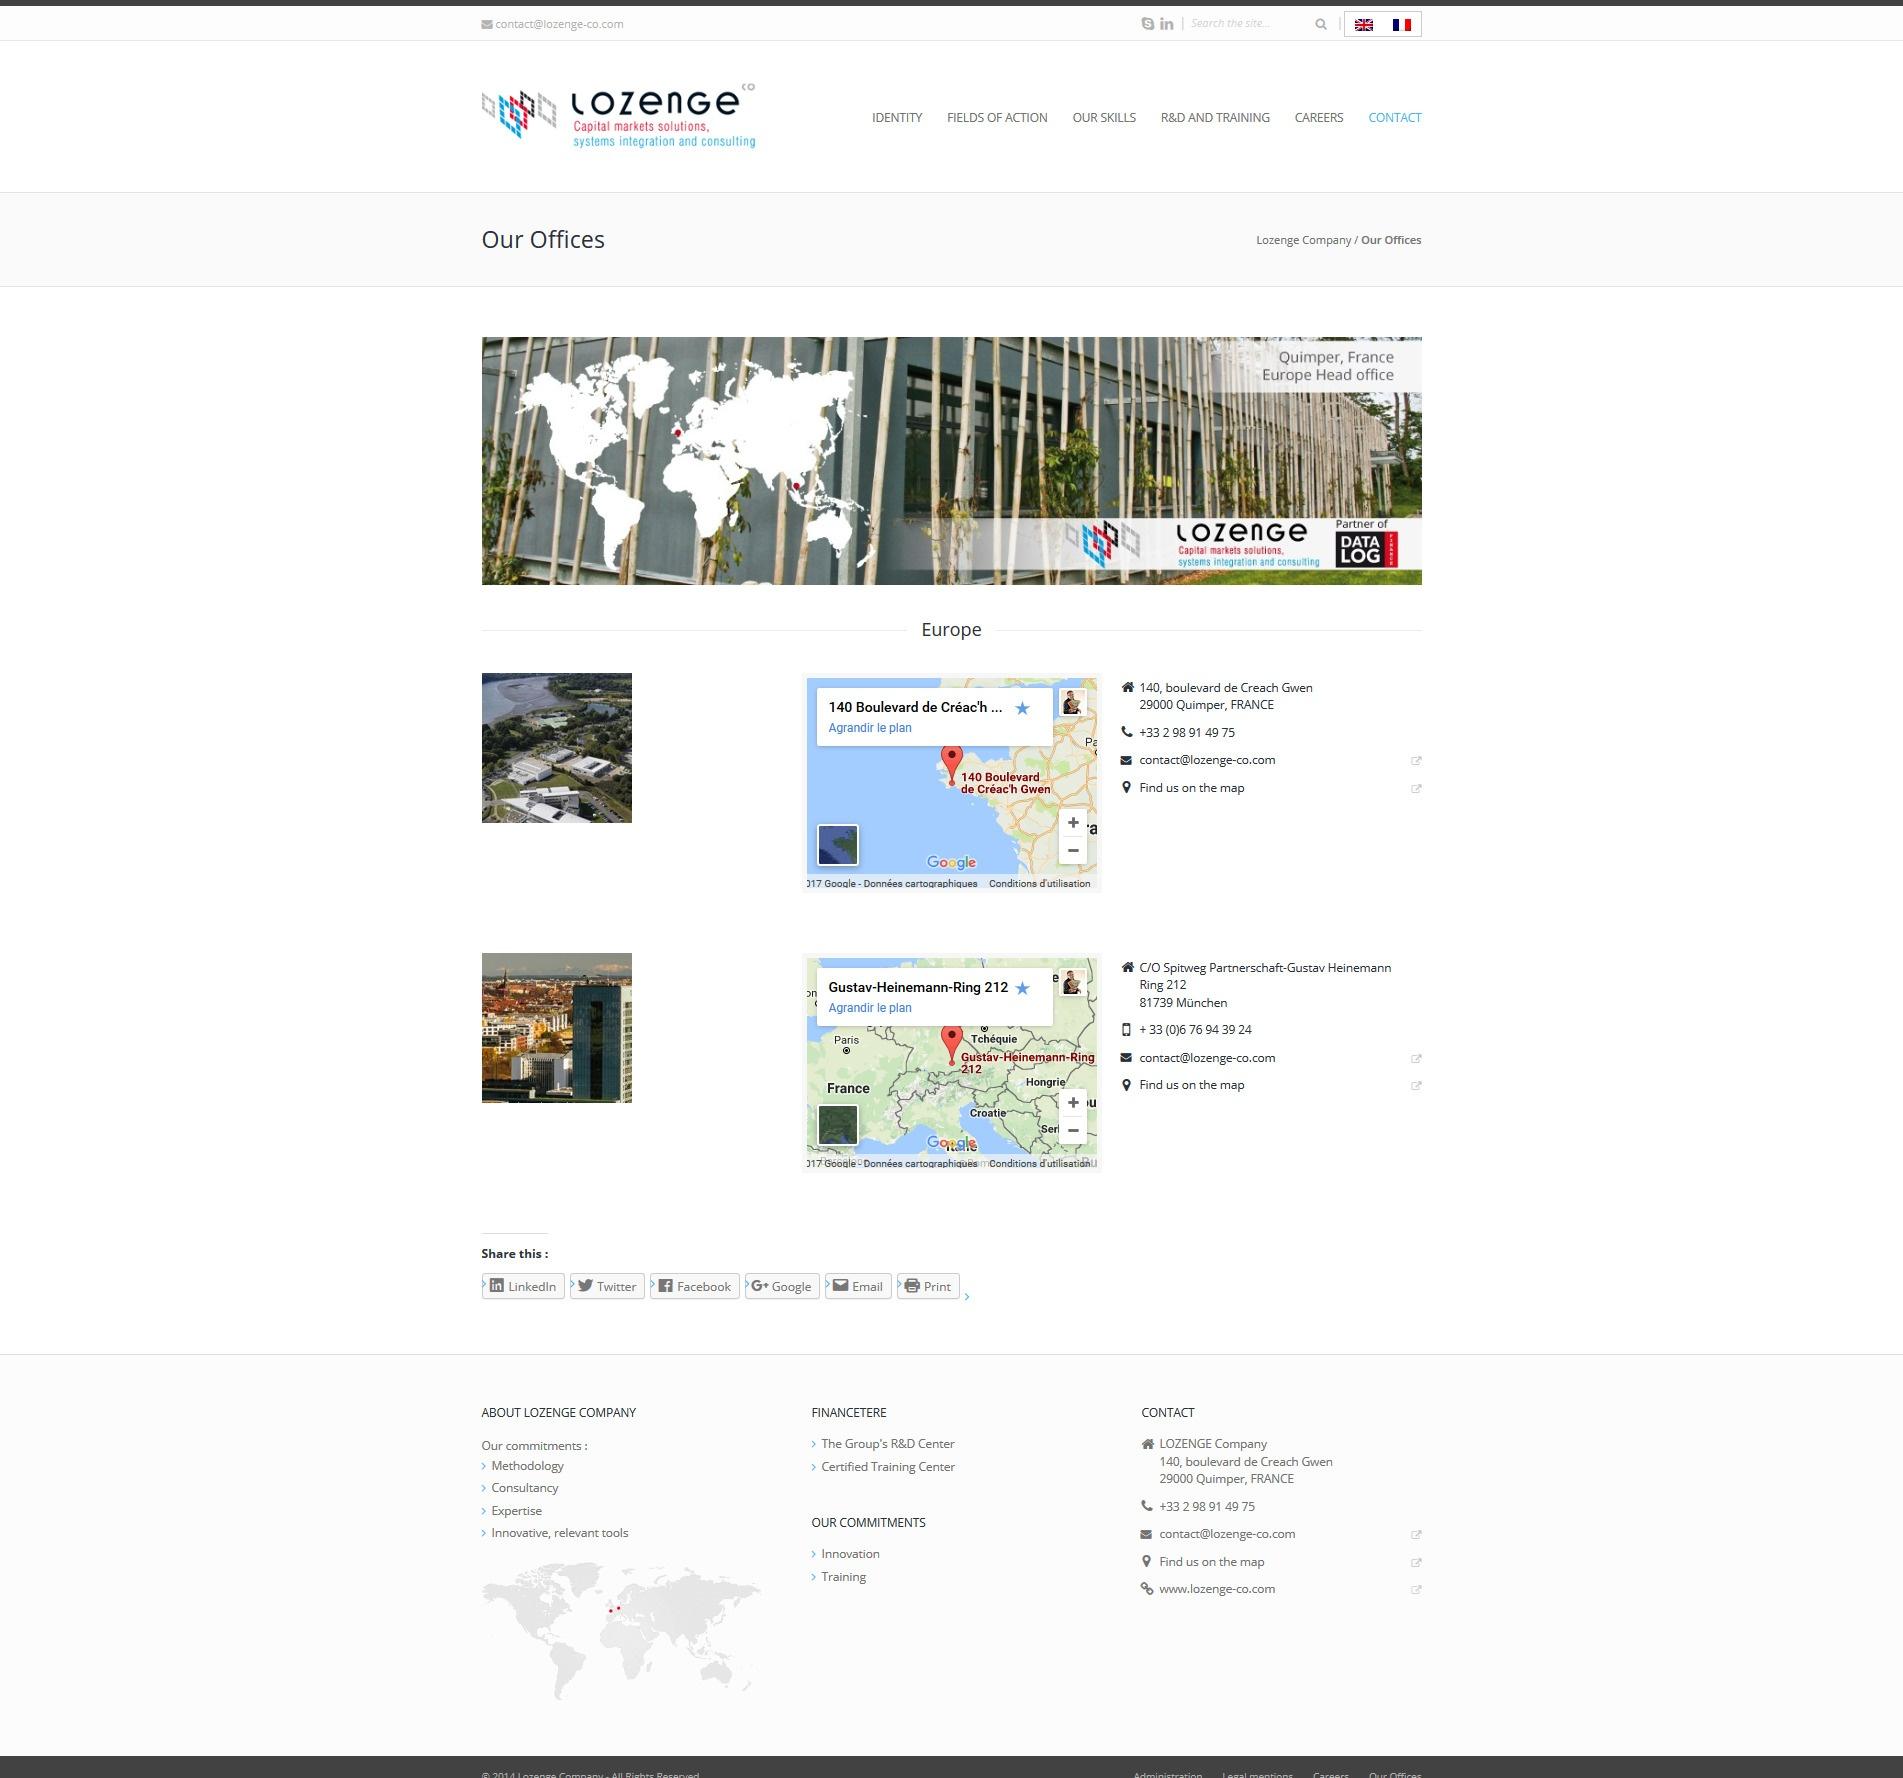 Lozenge Company - Contact